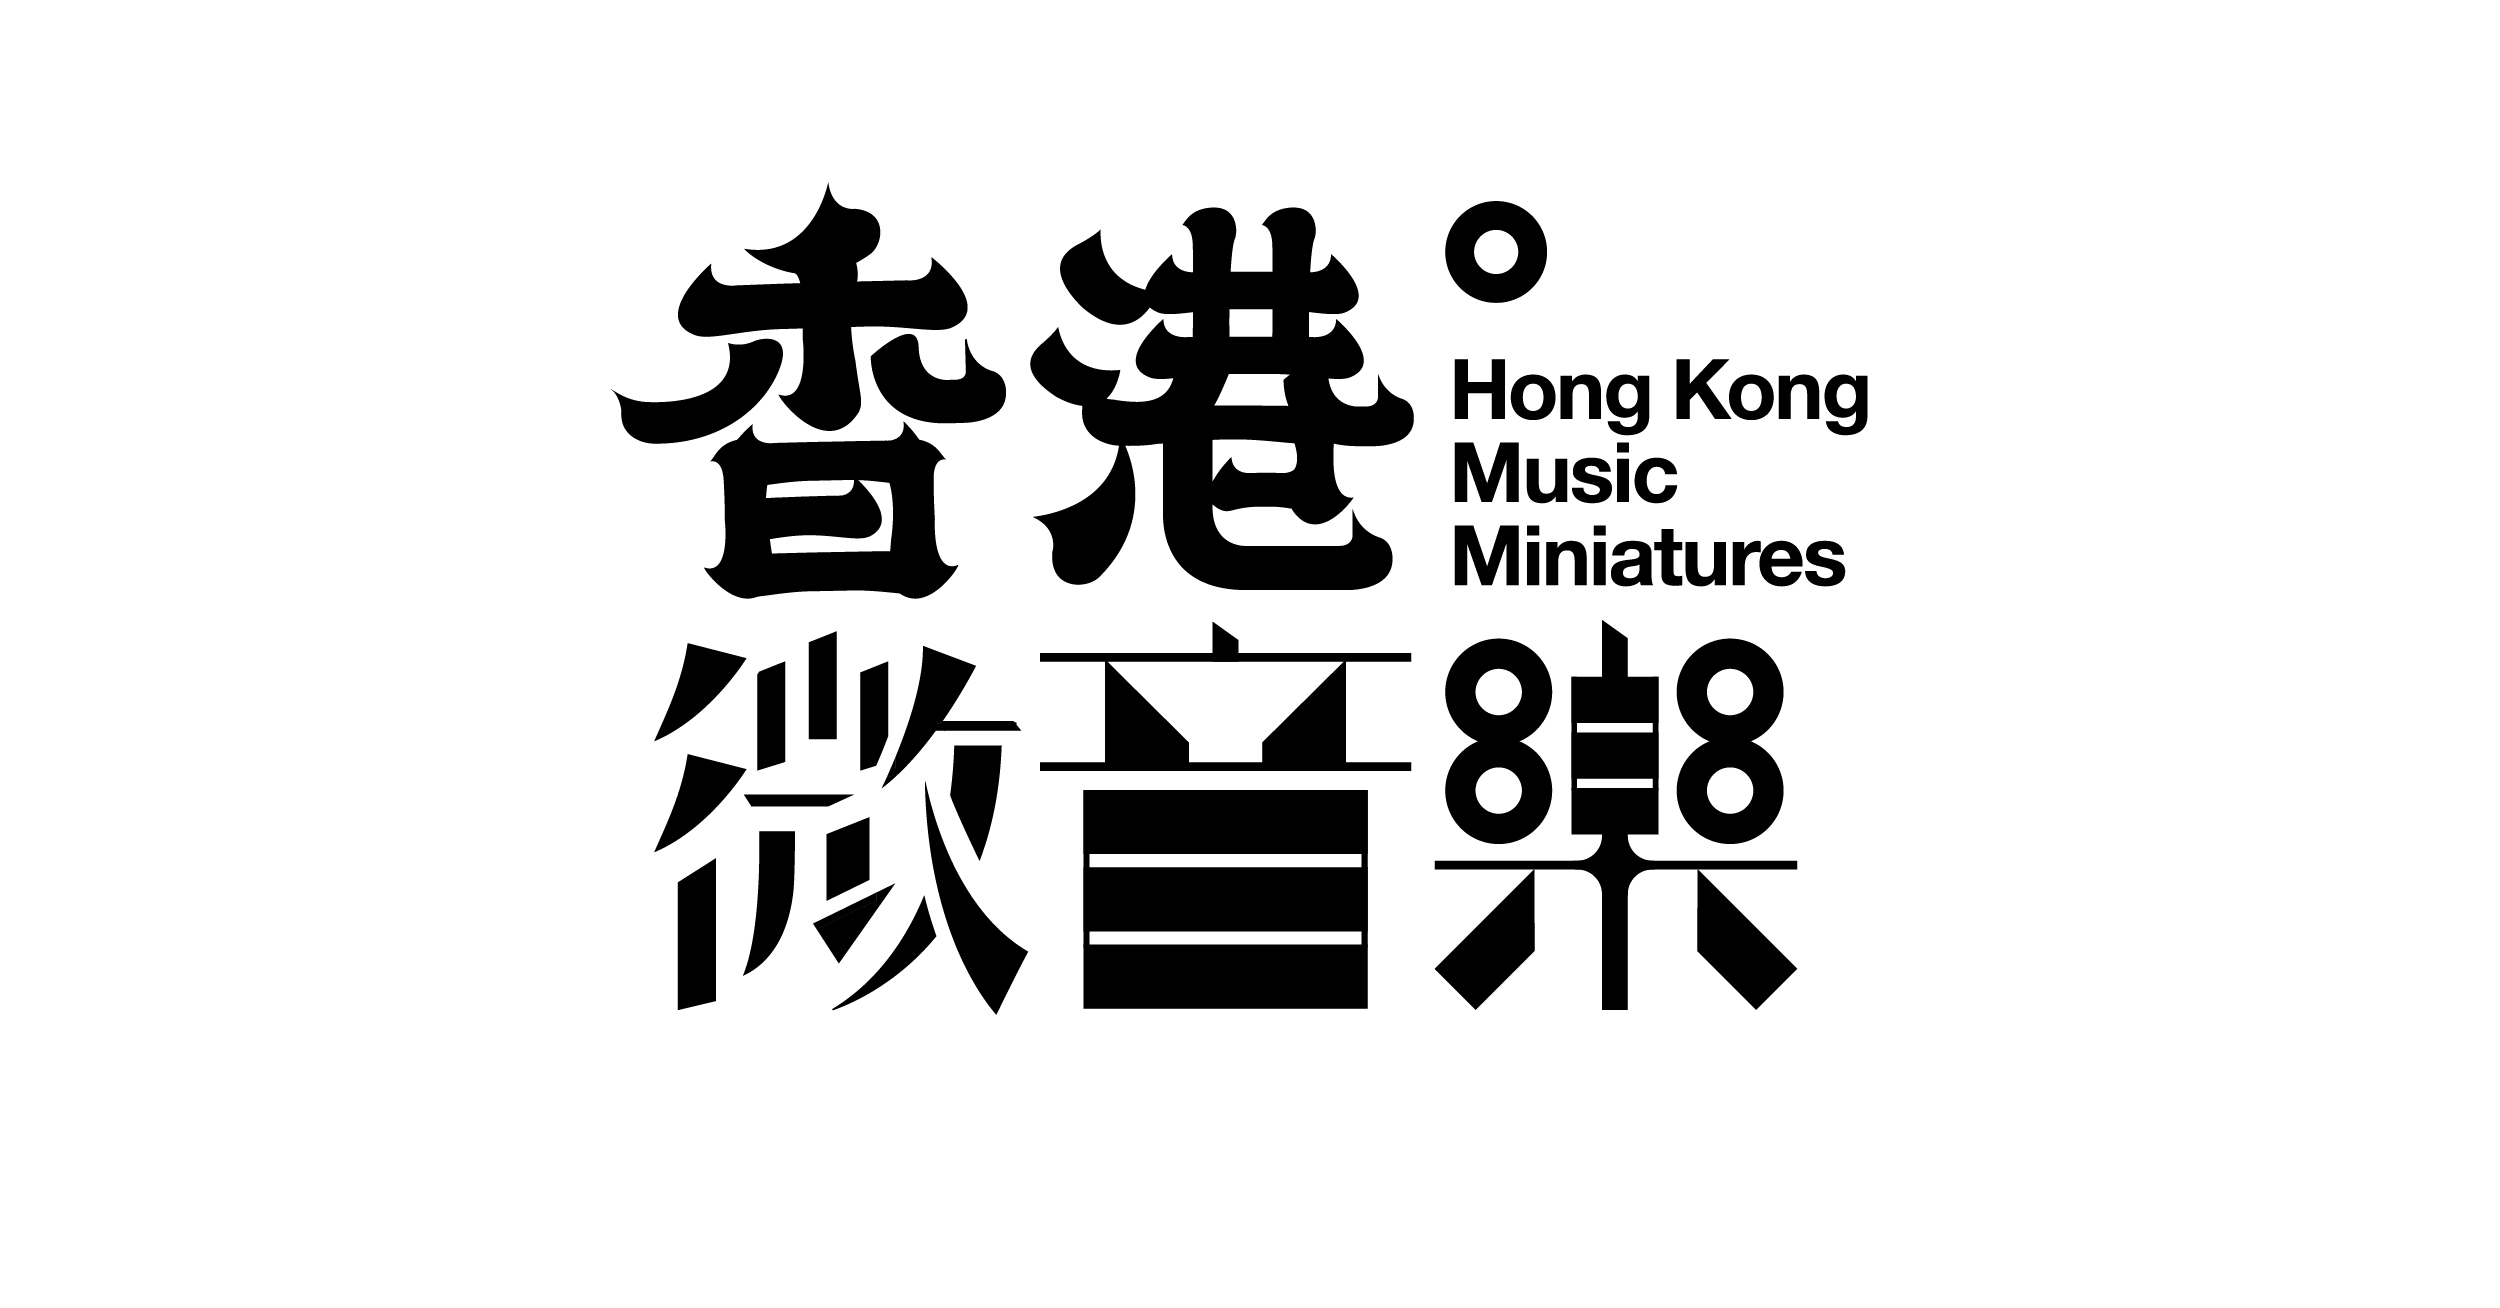 Hong Kong Music Miniatures